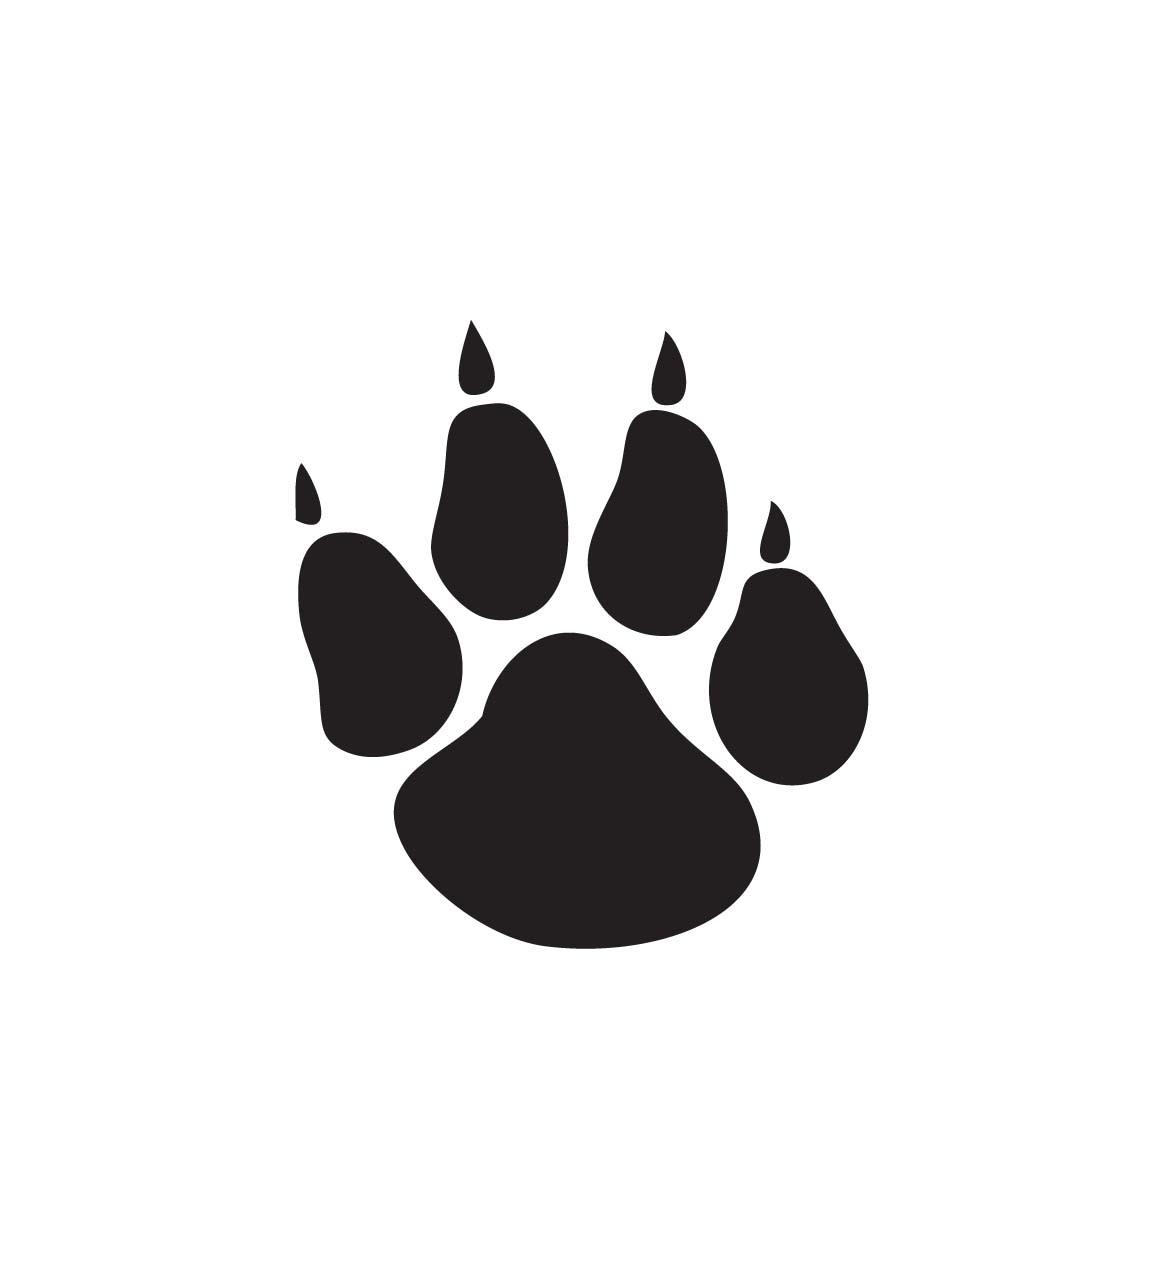 transparent download Free paw print download. Bobcat clipart panther